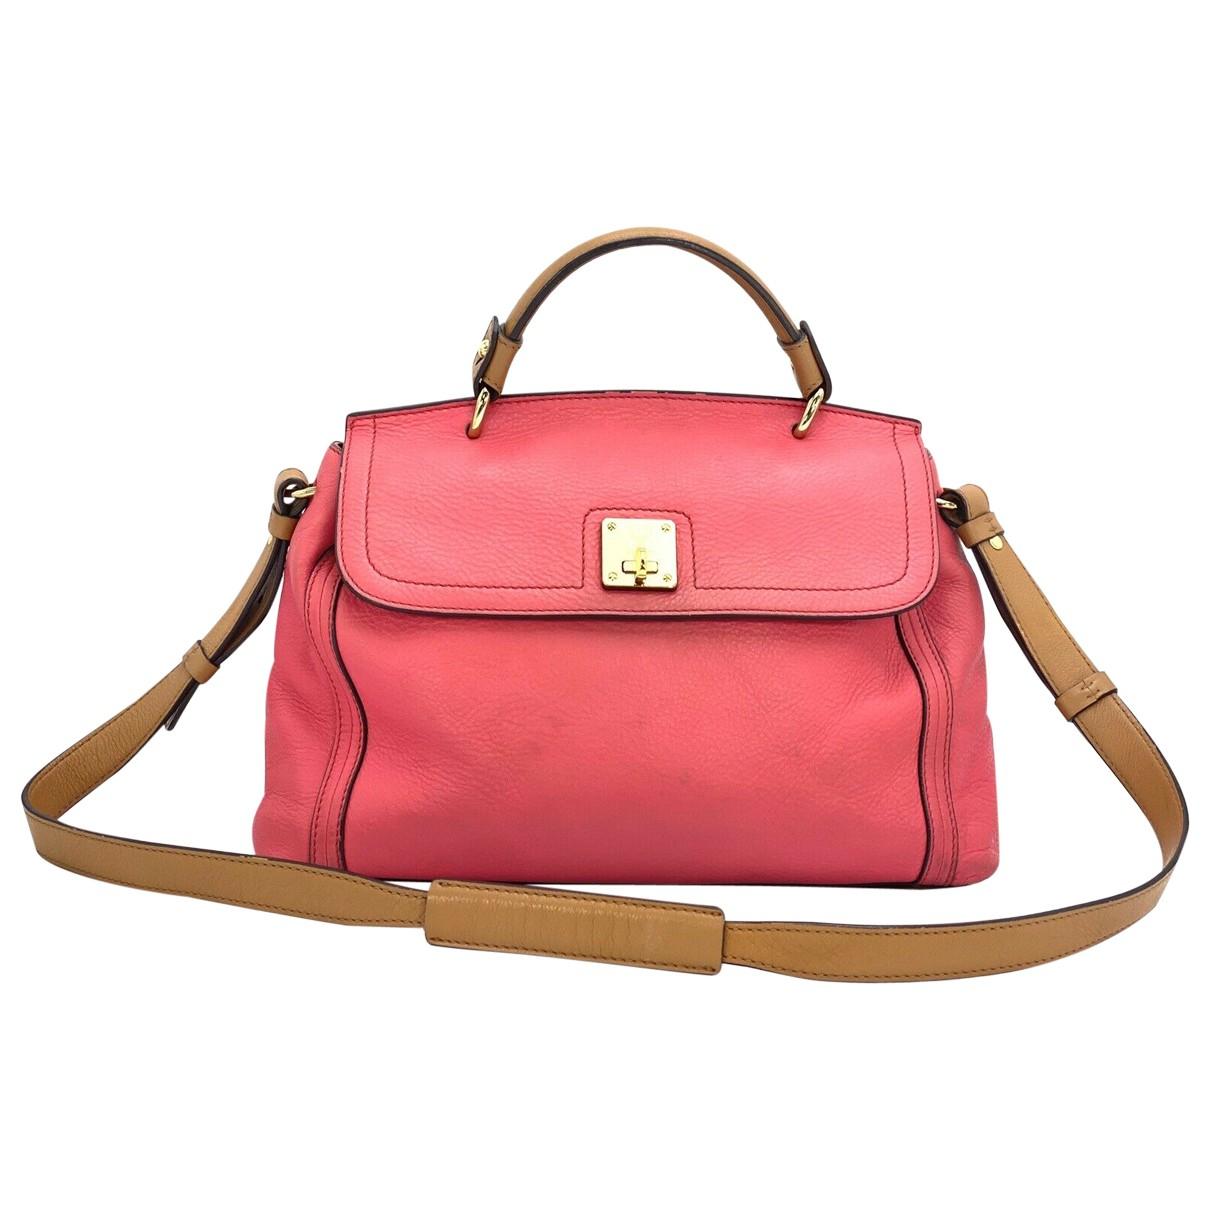 Mcm \N Pink Leather handbag for Women \N